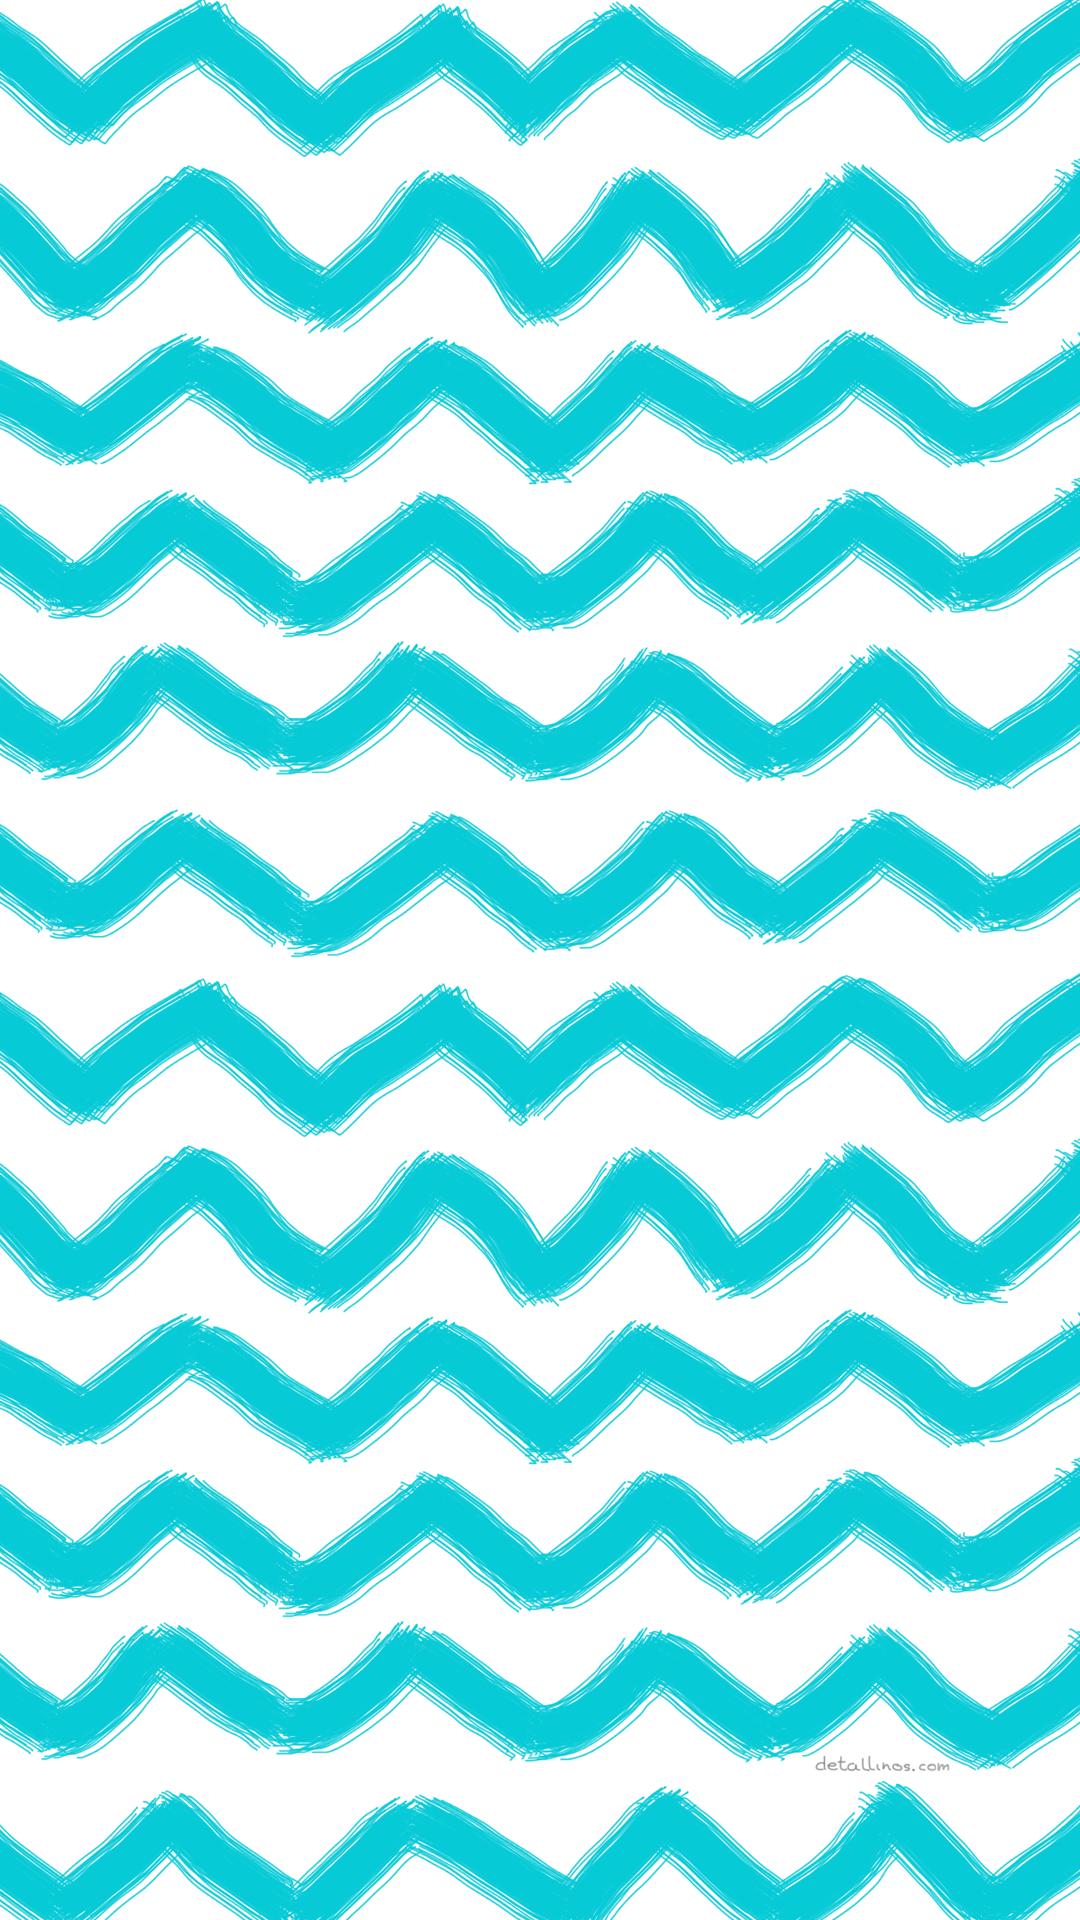 Fondos de pantalla veraniegos detallinos for Fondo blanco wallpaper